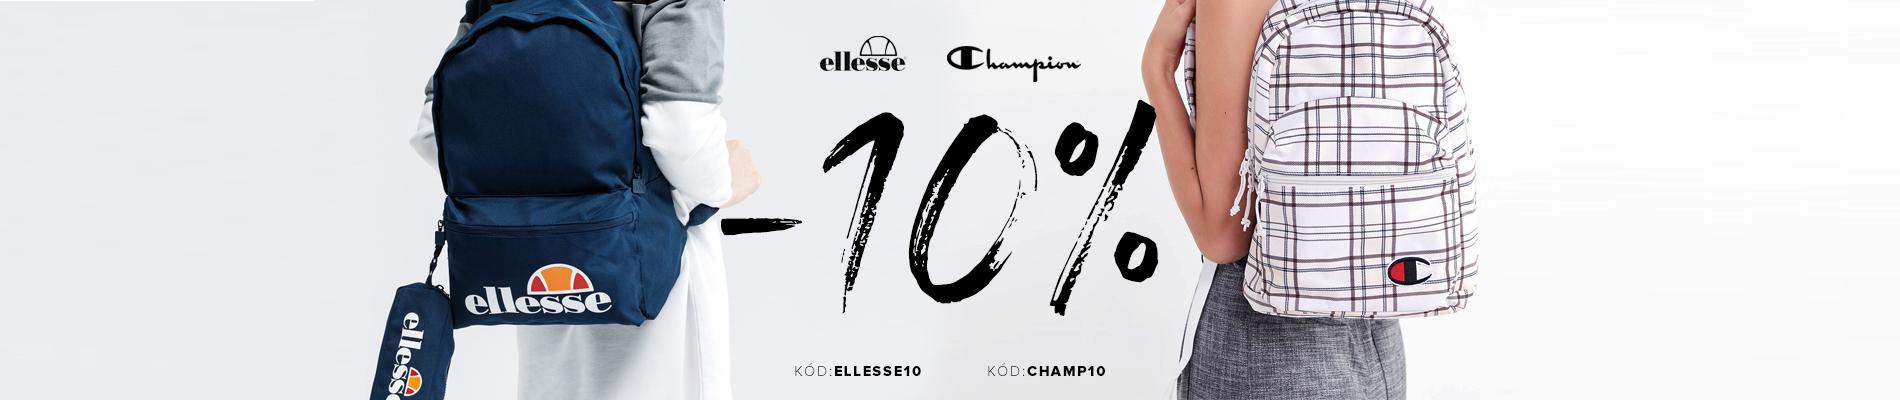 Champion+Ellesse